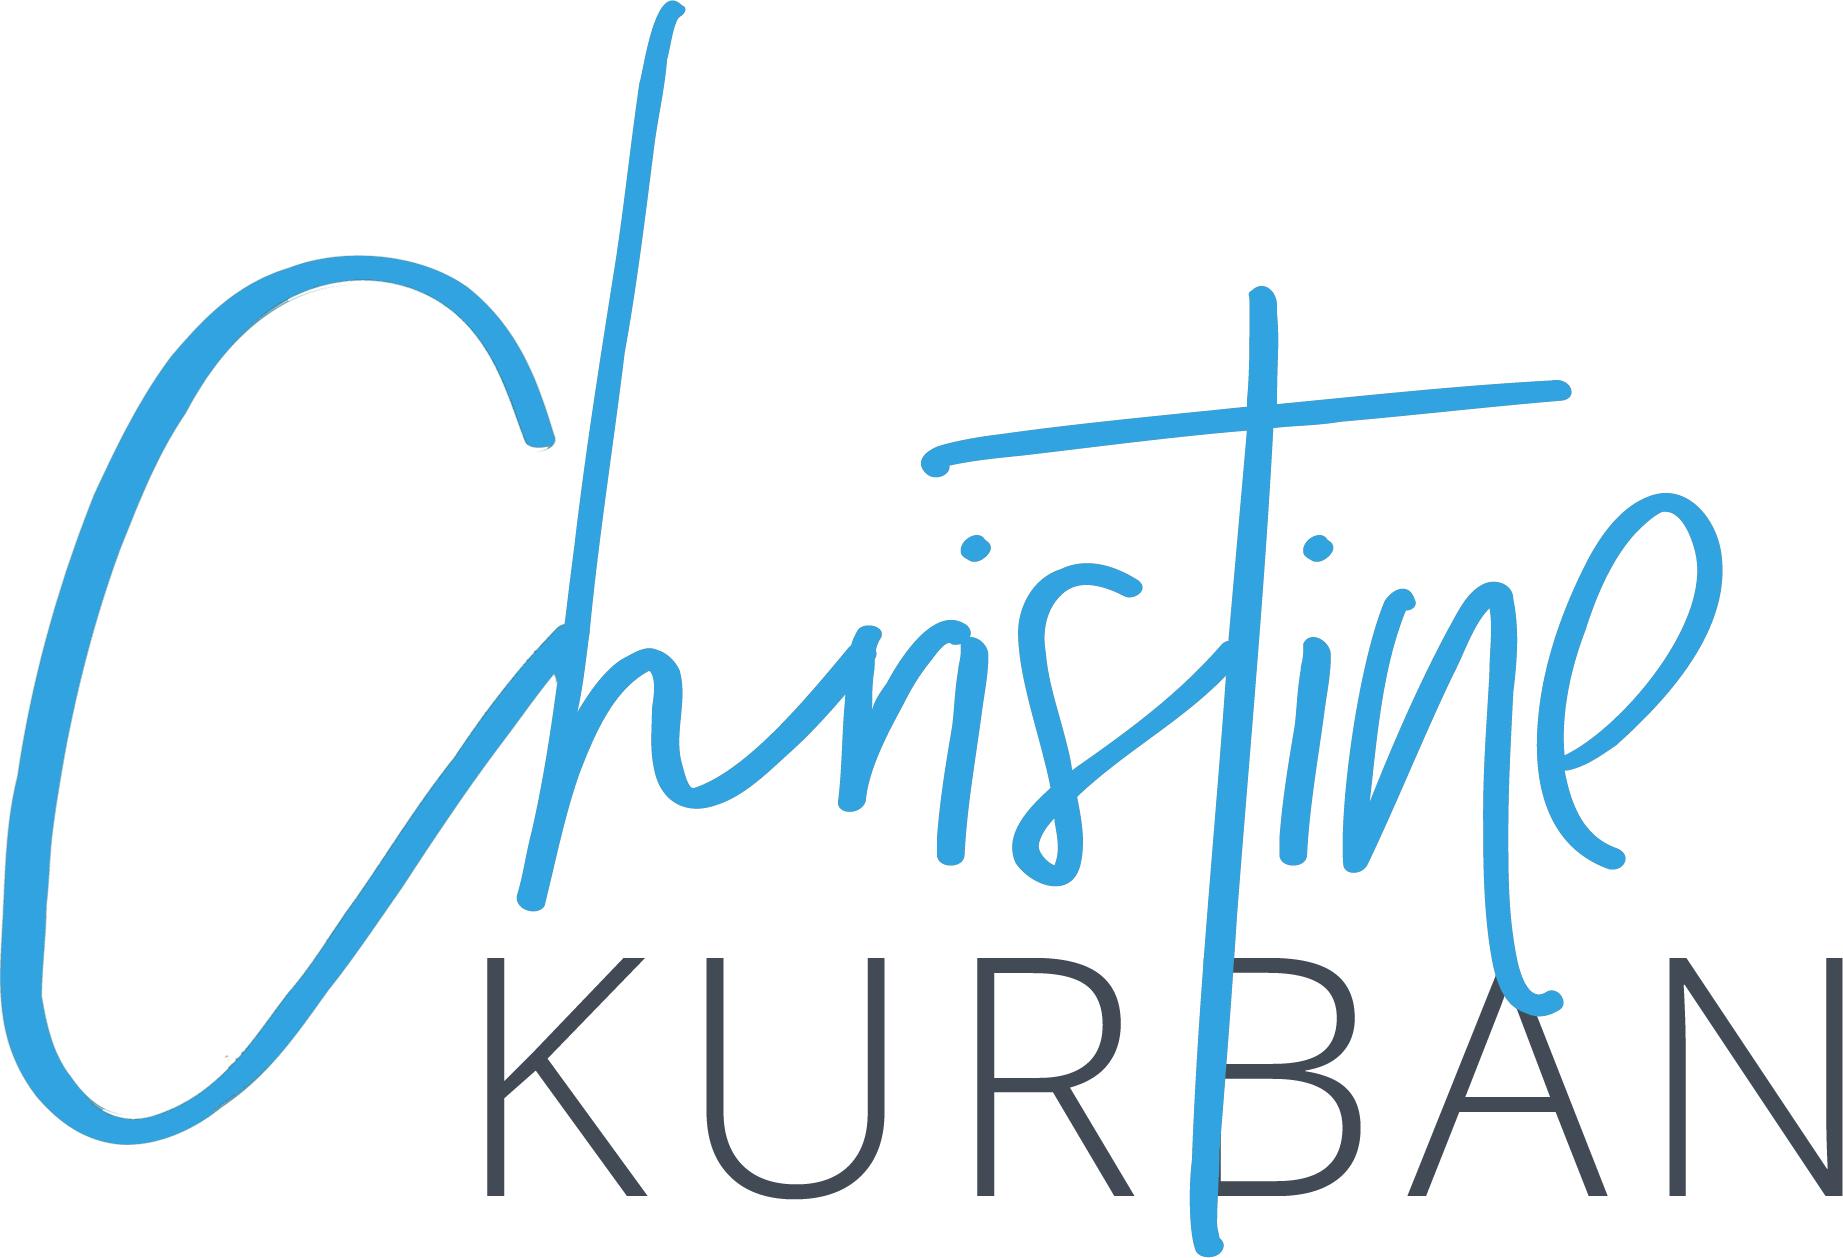 Christine Kurban